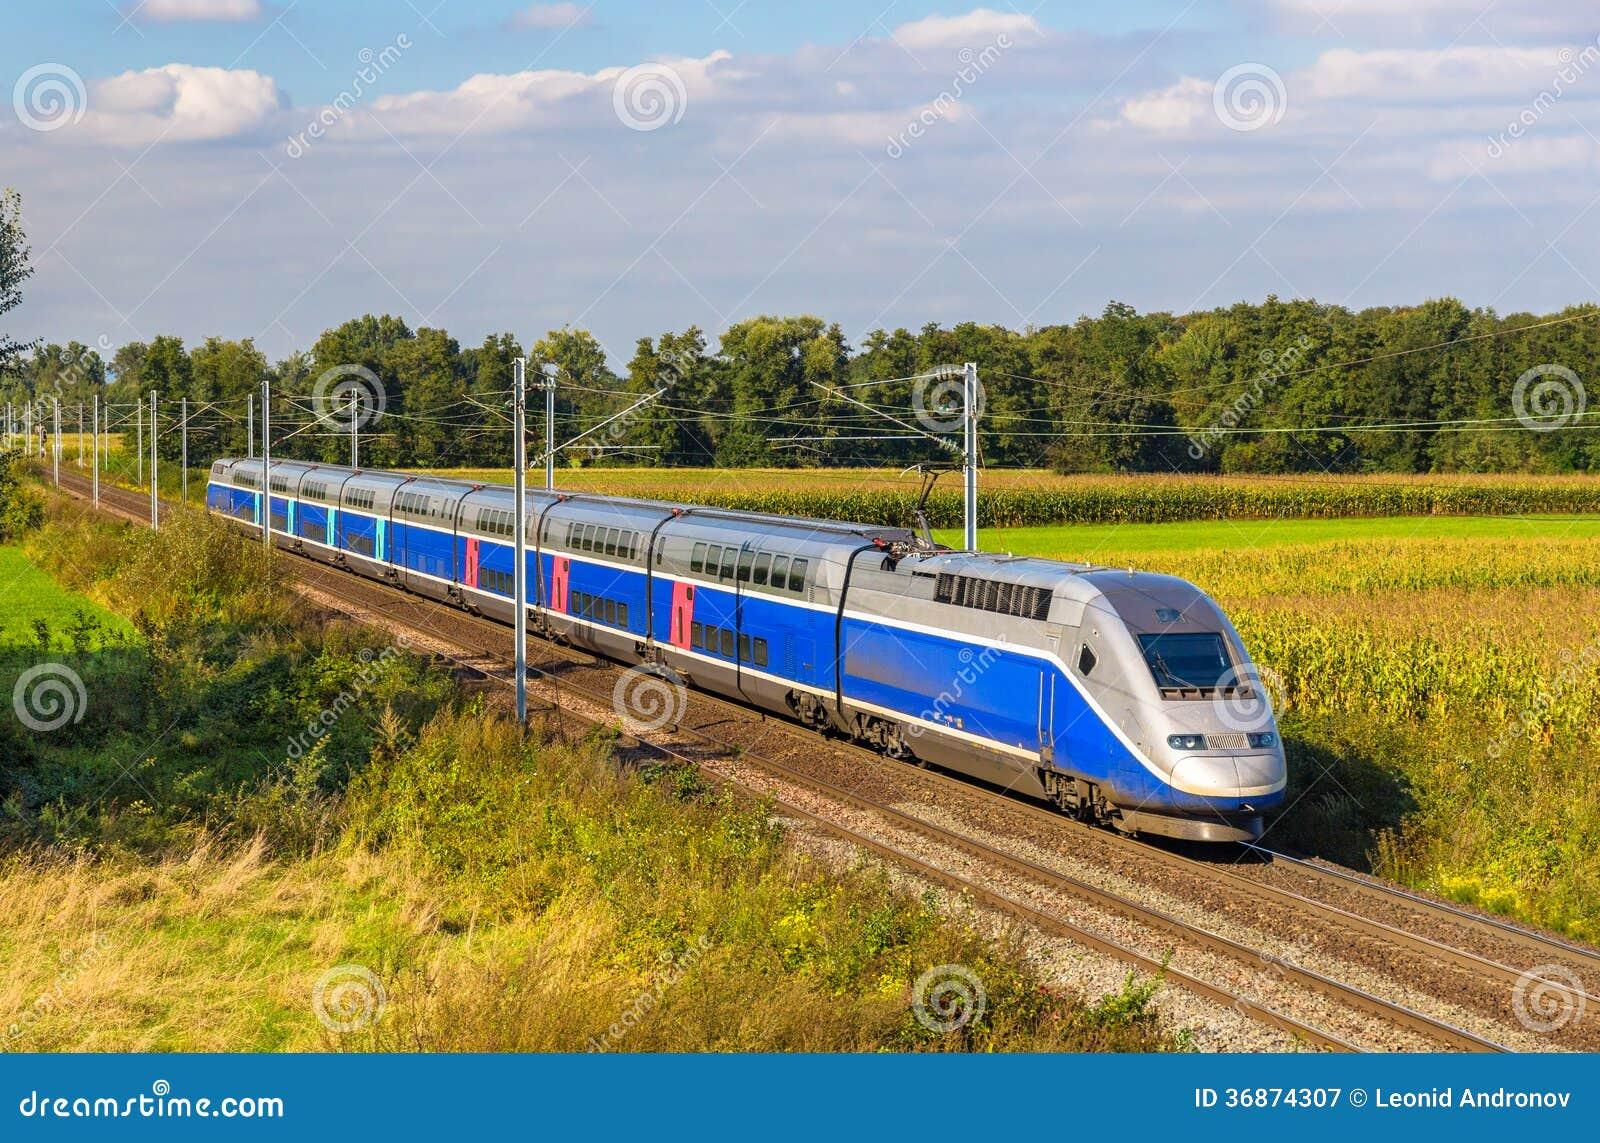 high speed train strasbourg paris france royalty free stock photography image 36874307. Black Bedroom Furniture Sets. Home Design Ideas